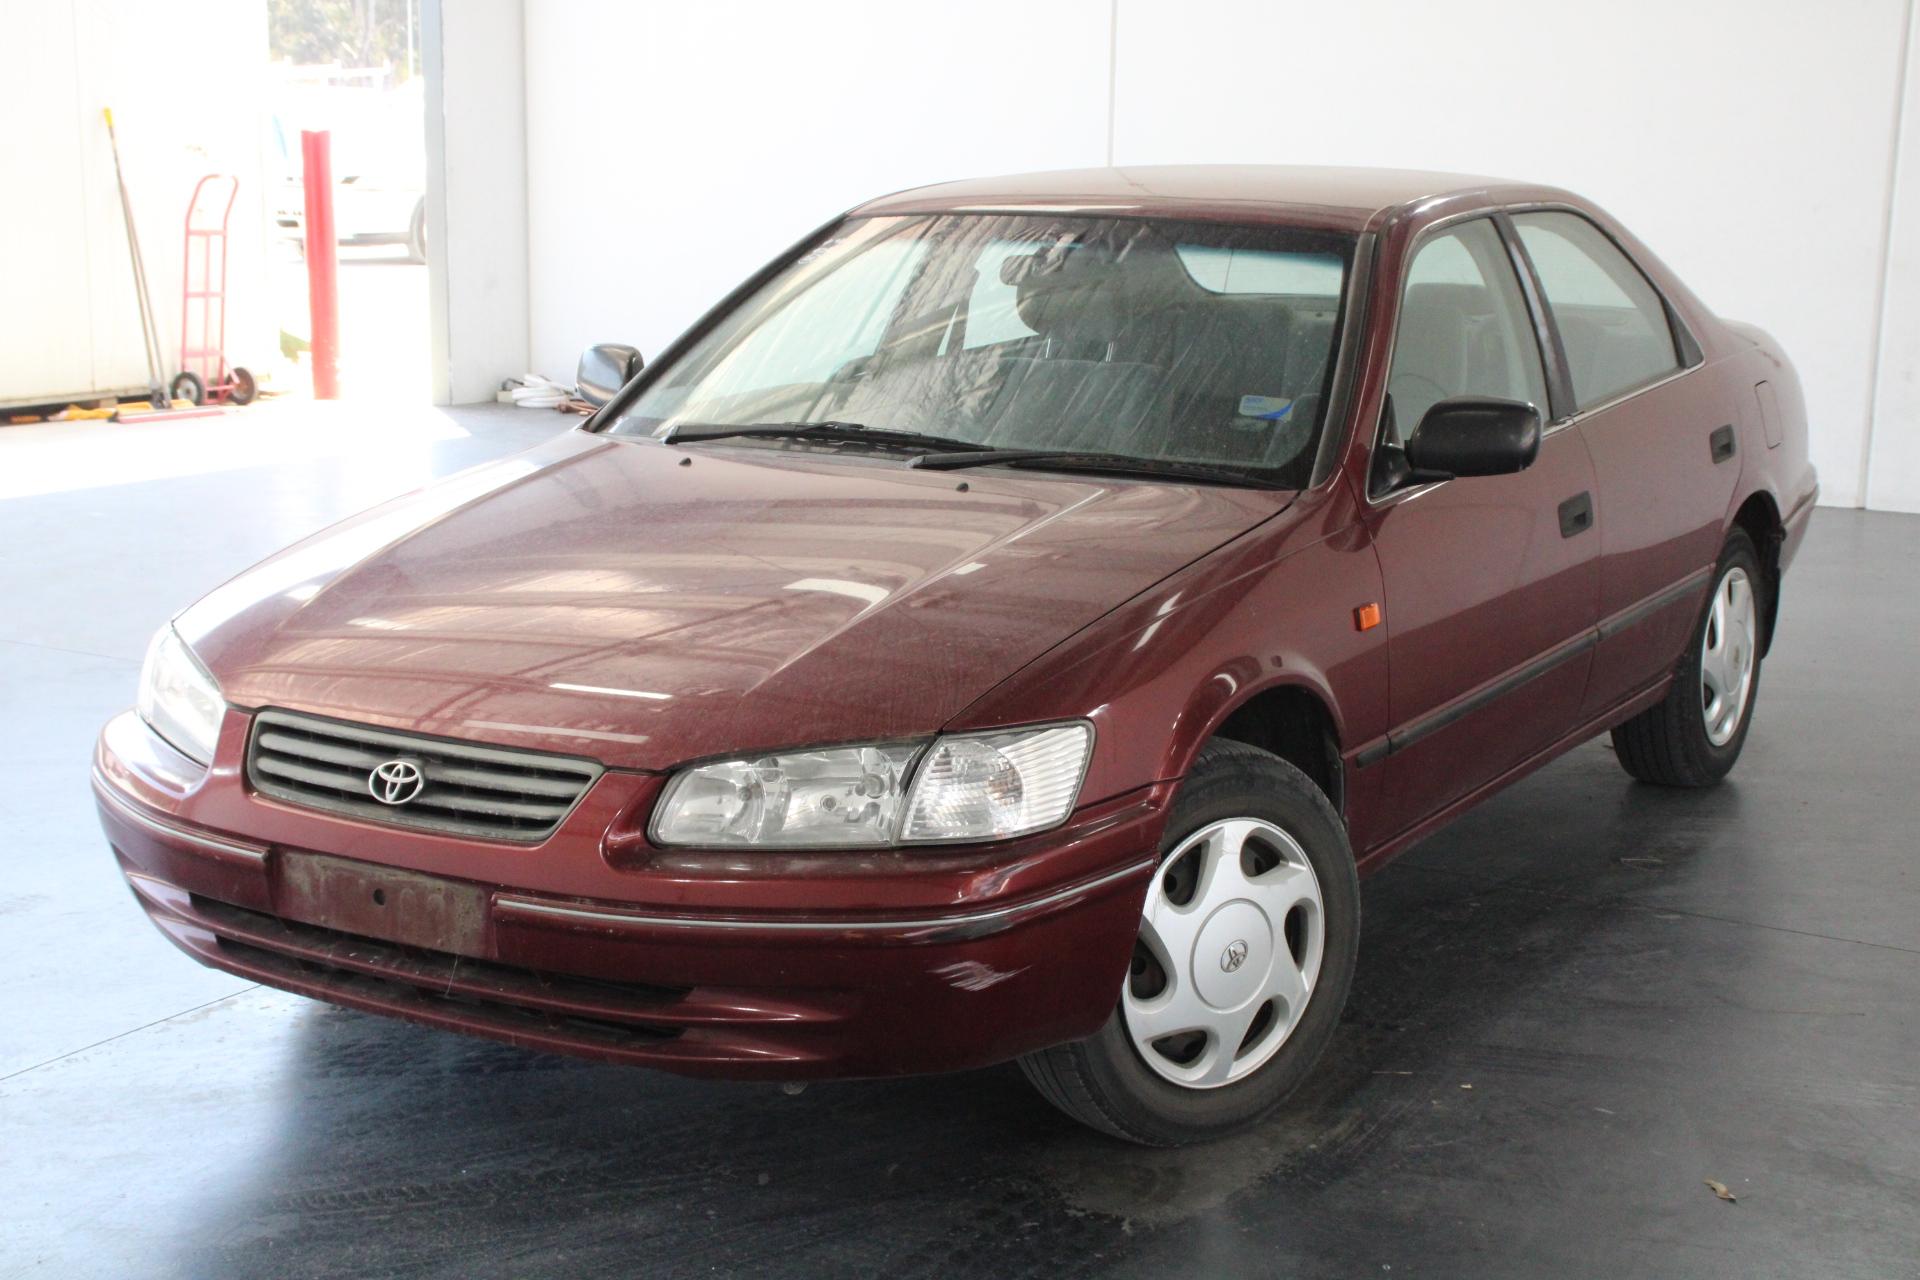 2001 Toyota Camry CSI SXV20R Manual Sedan